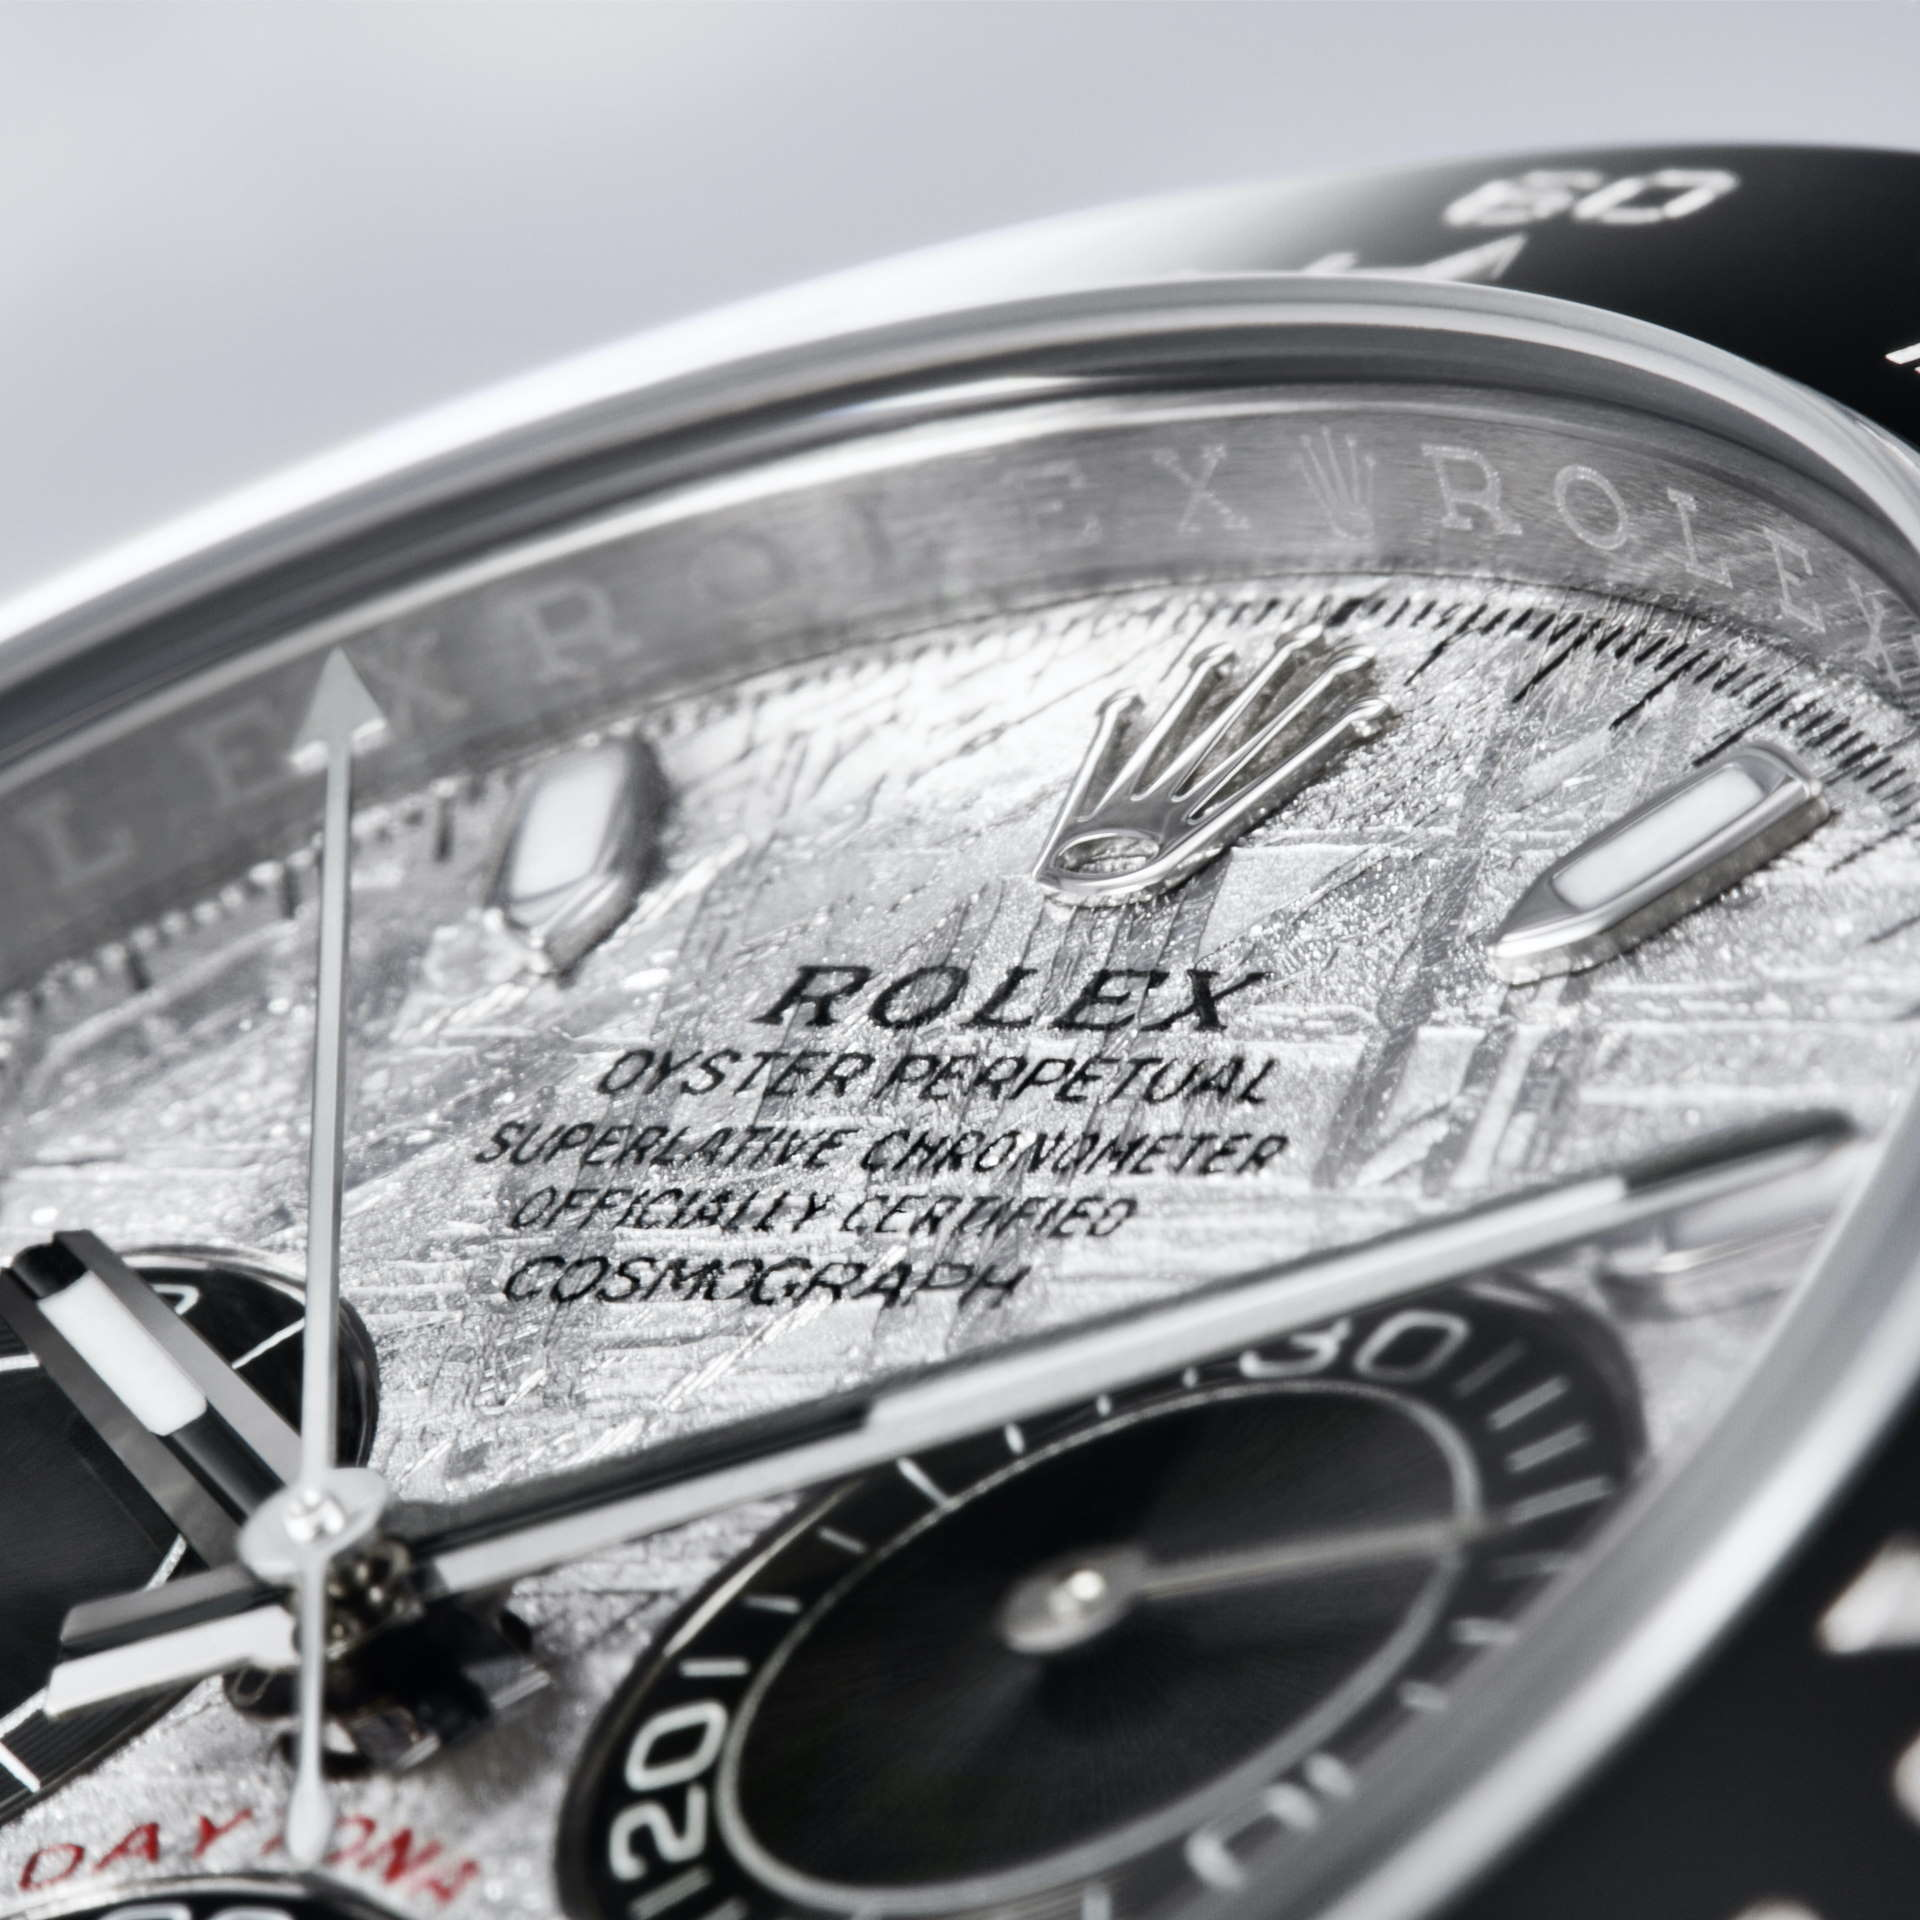 Rolex Oyster Perpetual Cosmograph Daytona Meteorite